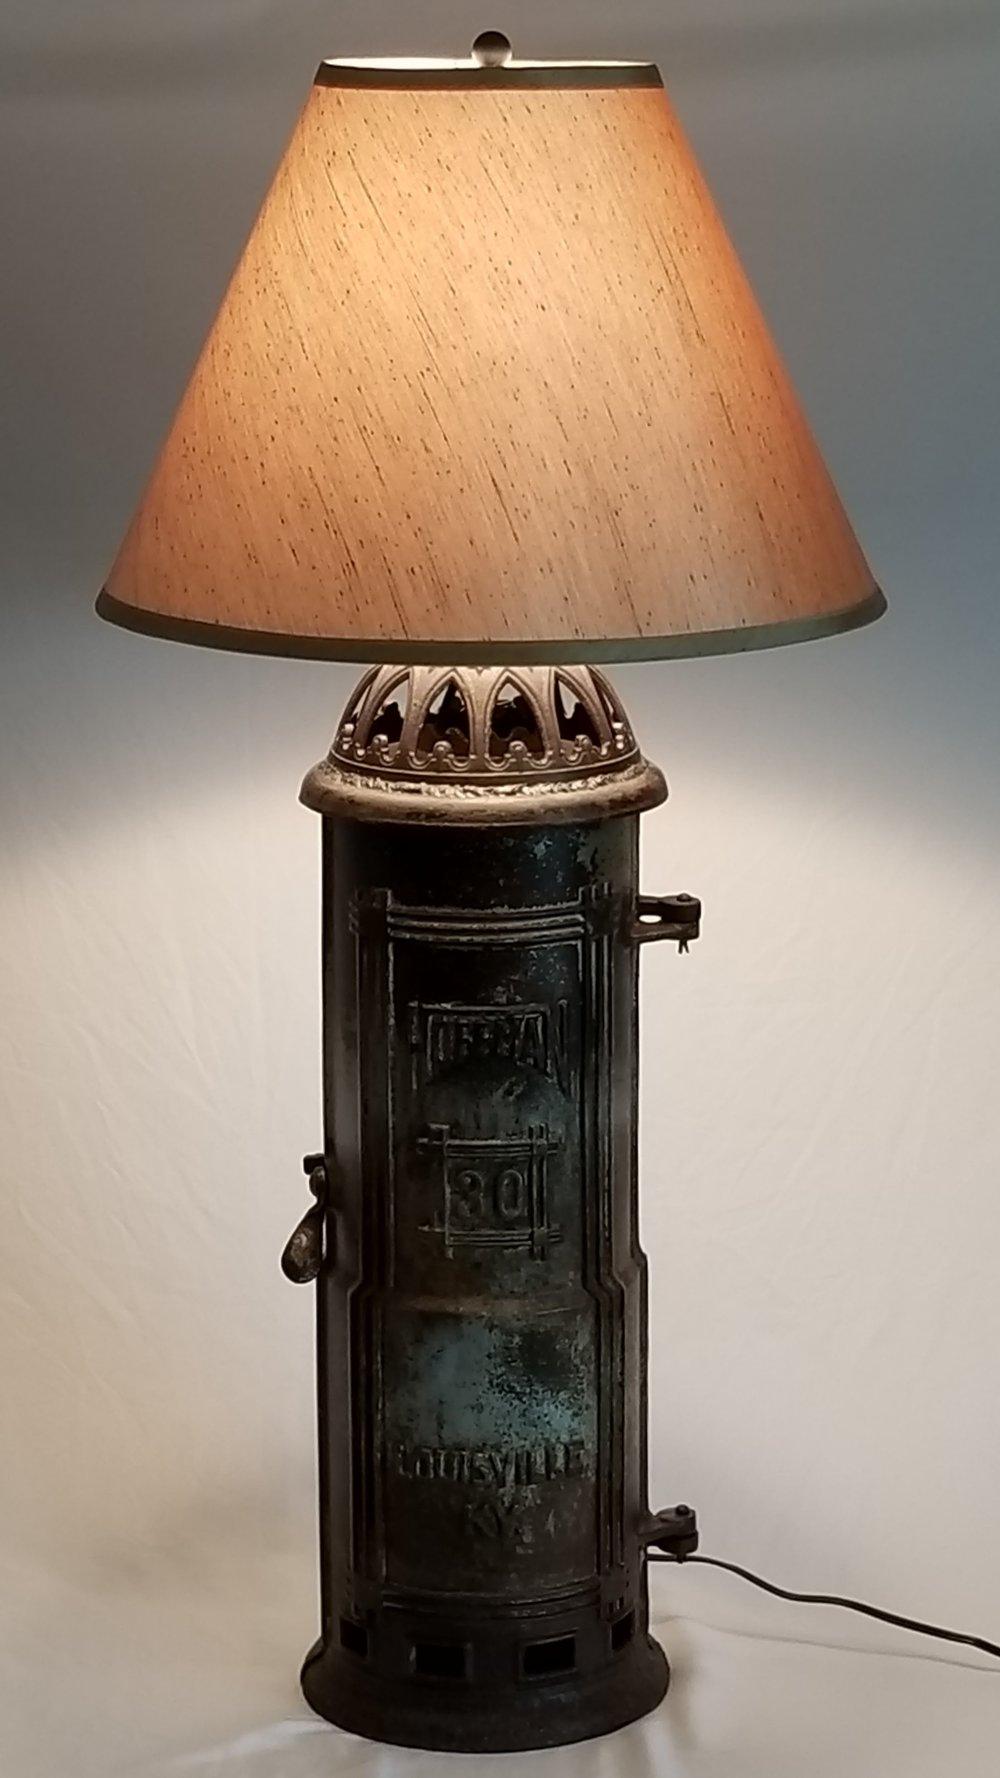 Hot Water Lamp I